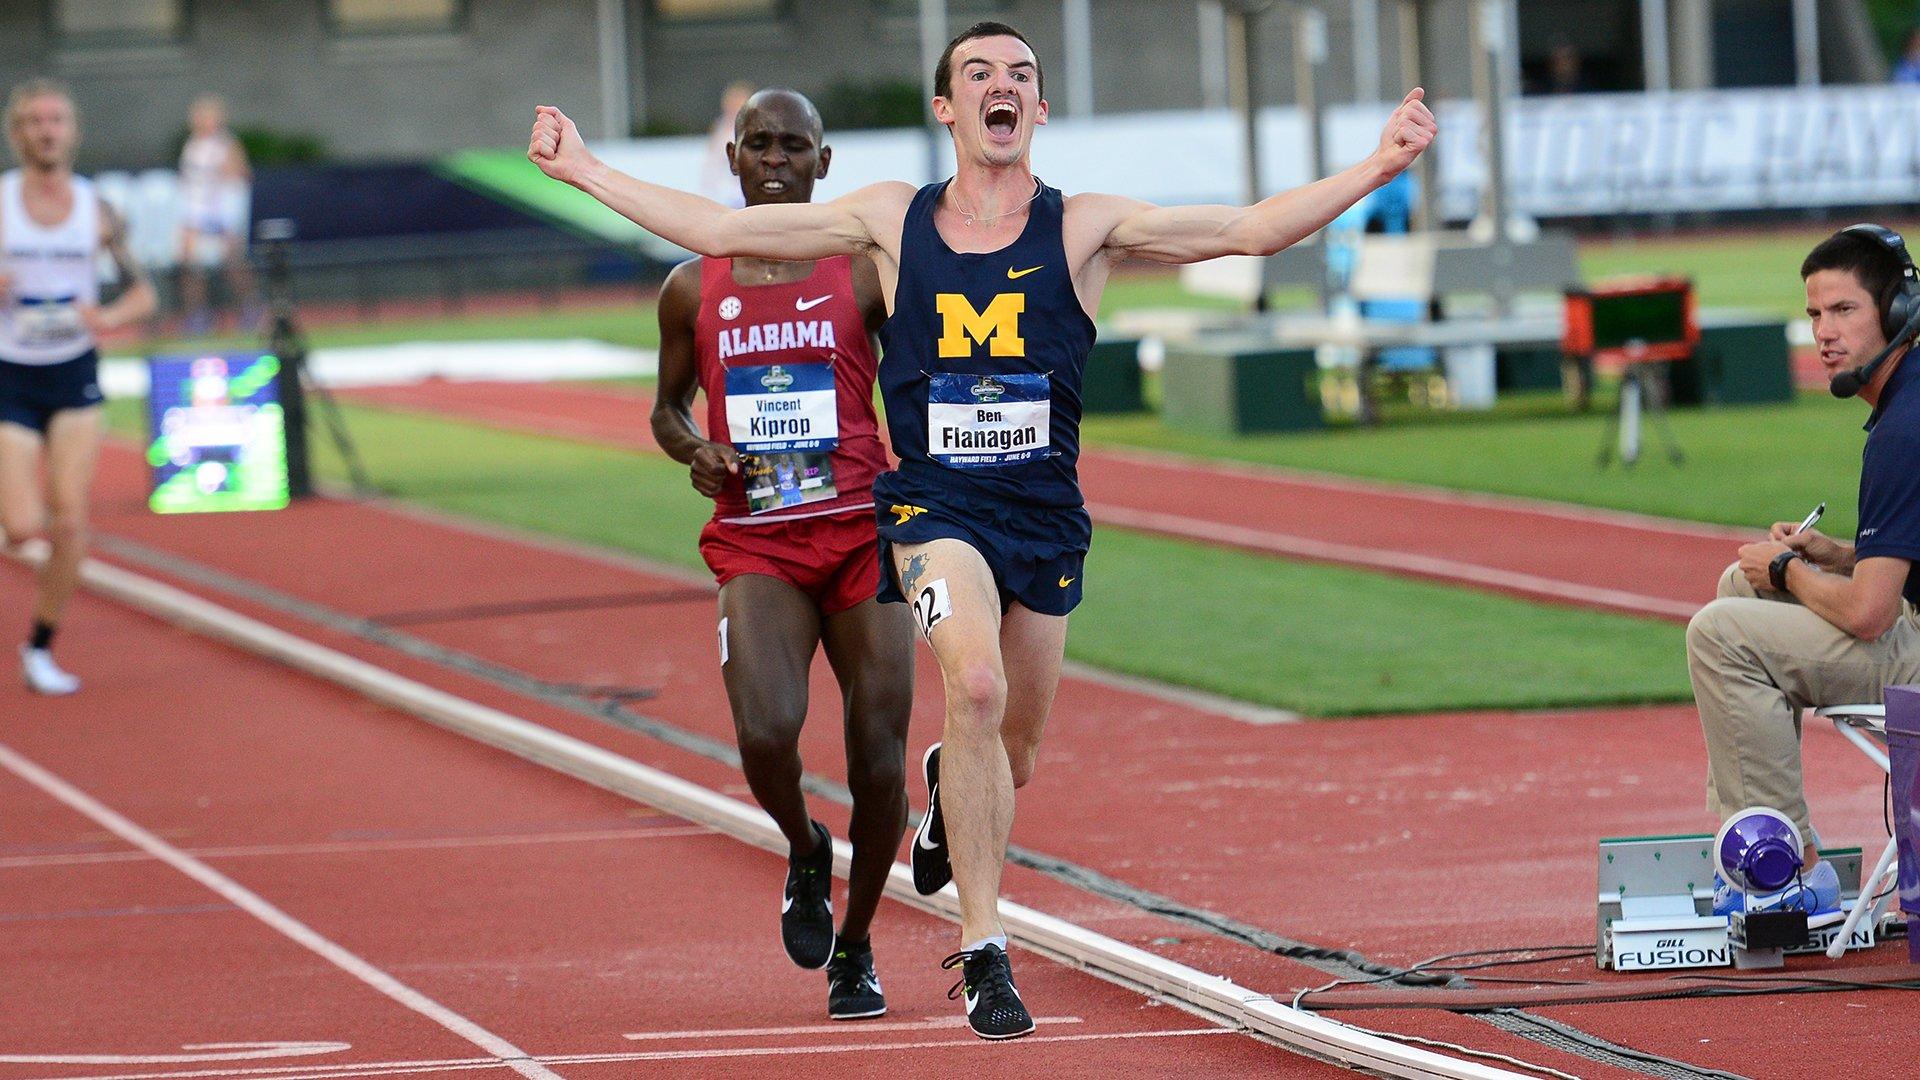 Ben-Flanagan-St-Mary's-alumnus-NCAA-10,000m-championship-June-2018